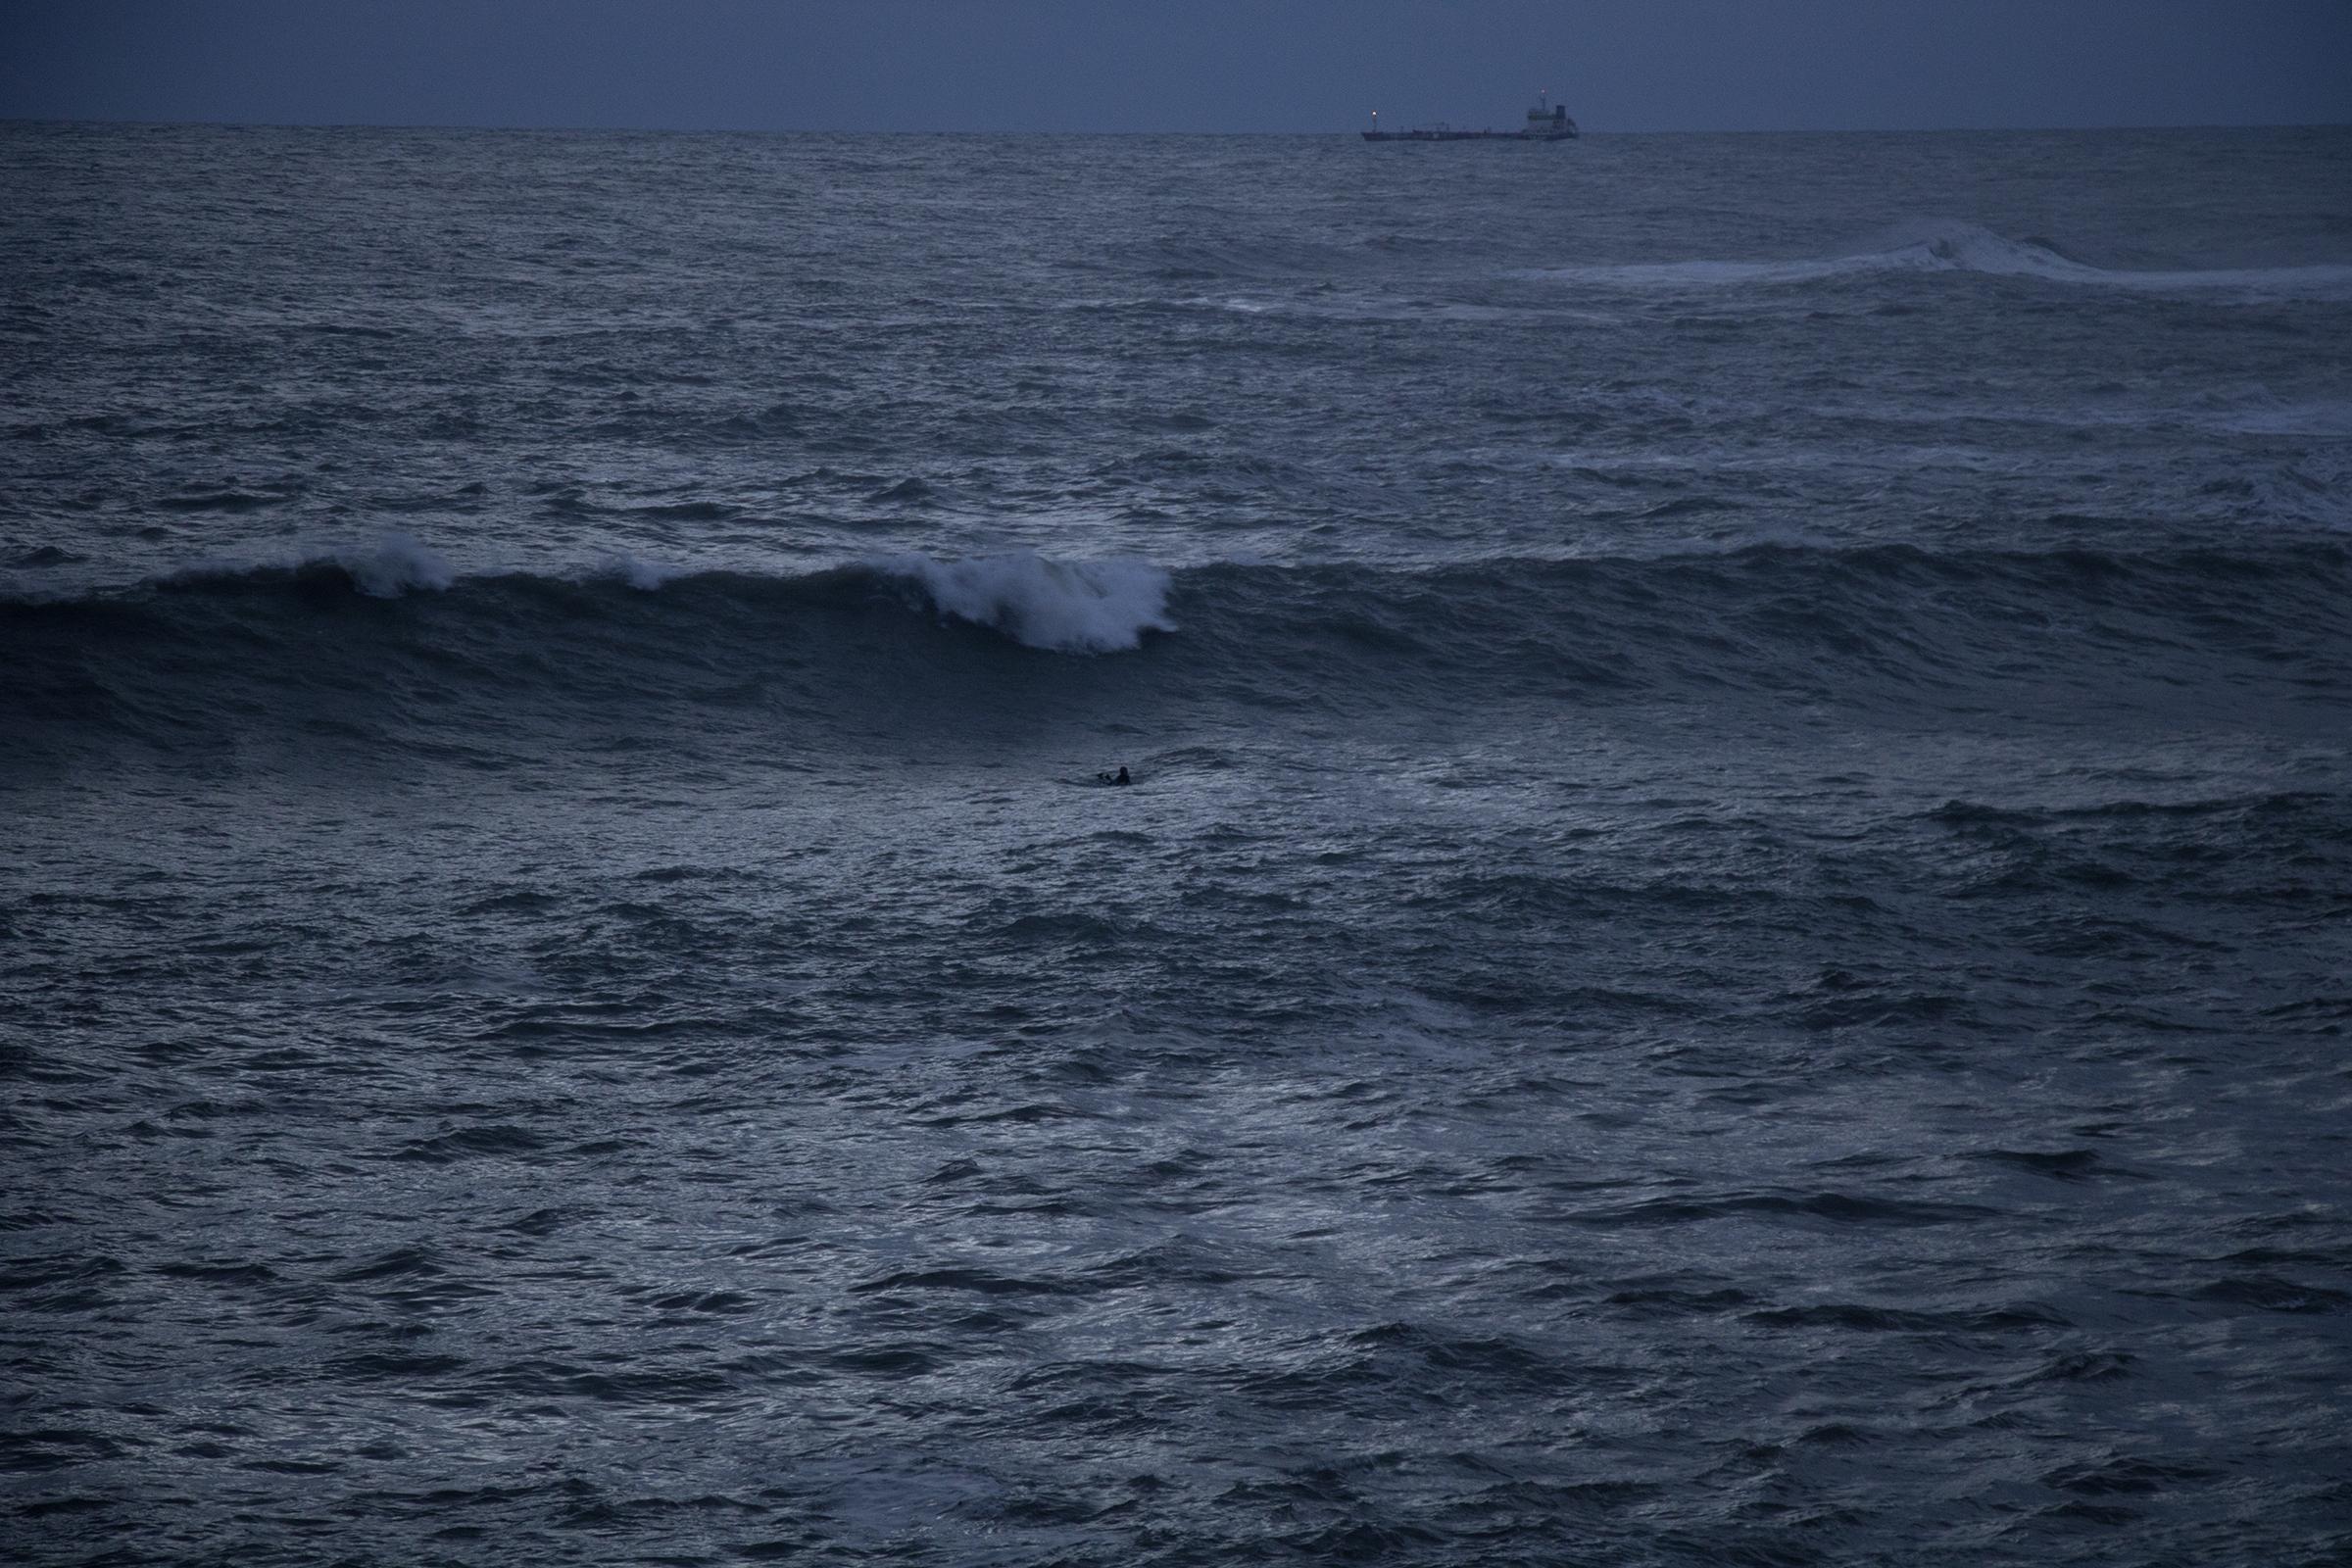 grosse vague, big swell, session nocturne, tempête, surf, surfeur, surfeuse.fr